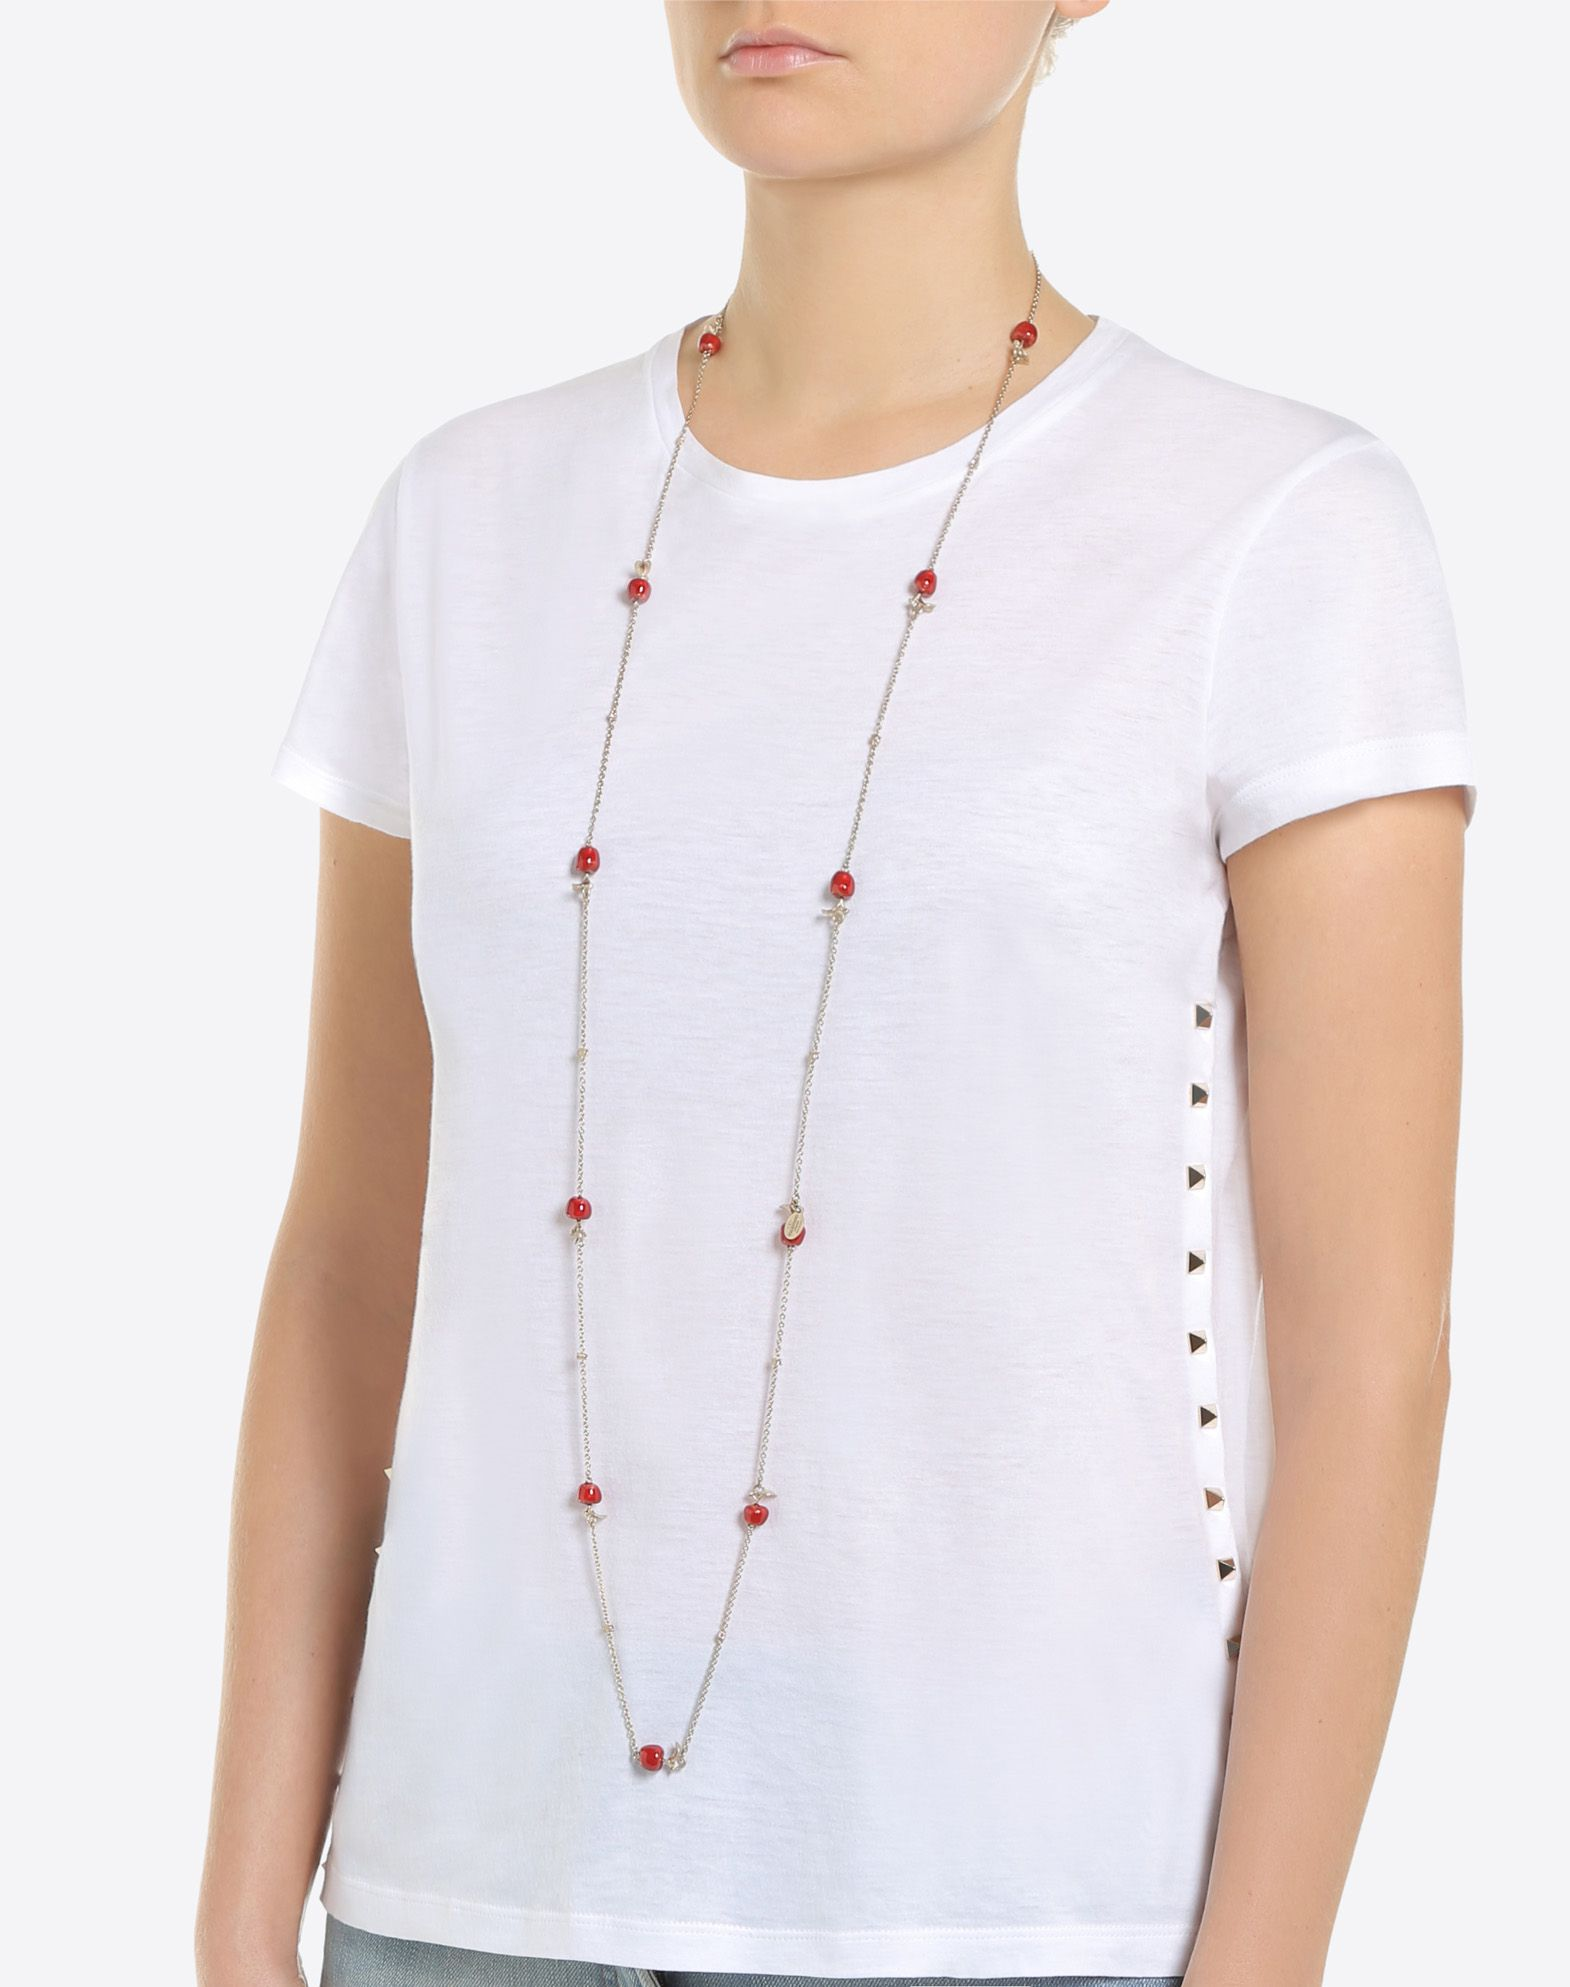 VALENTINO GARAVANI Long necklace Necklace D a